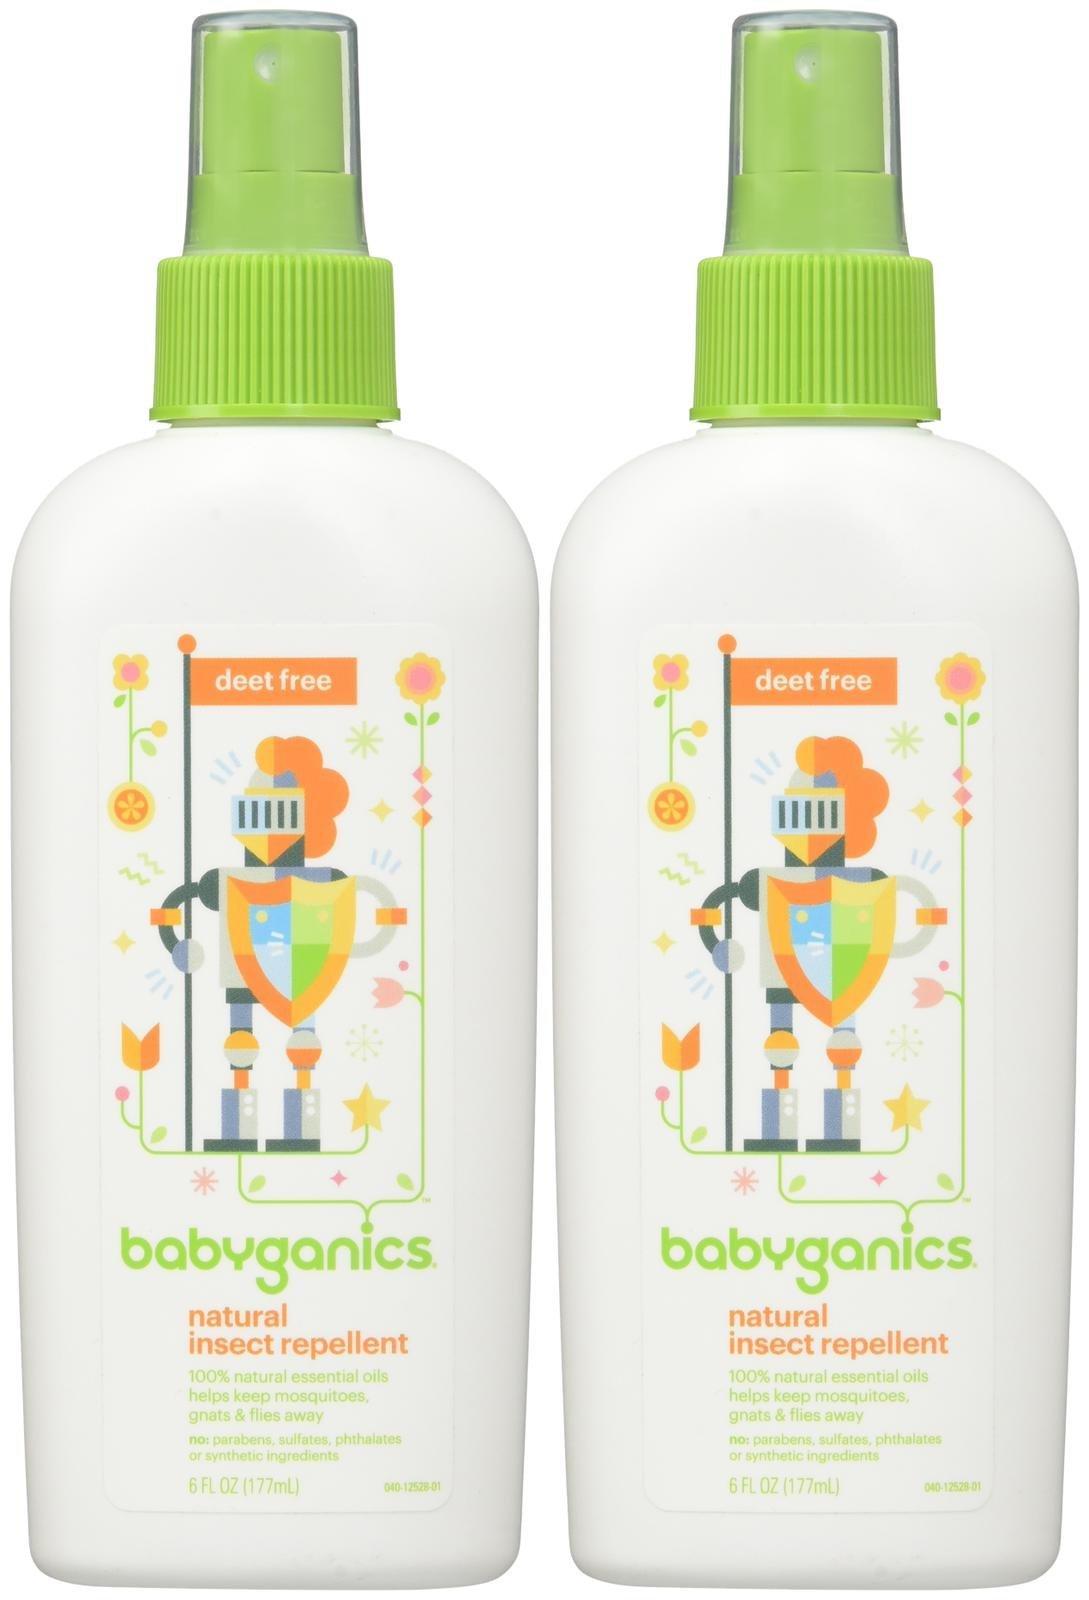 Babyganics Natural Deet Free Insect Repellent - Fragrance Free - 6 oz - 2 pk